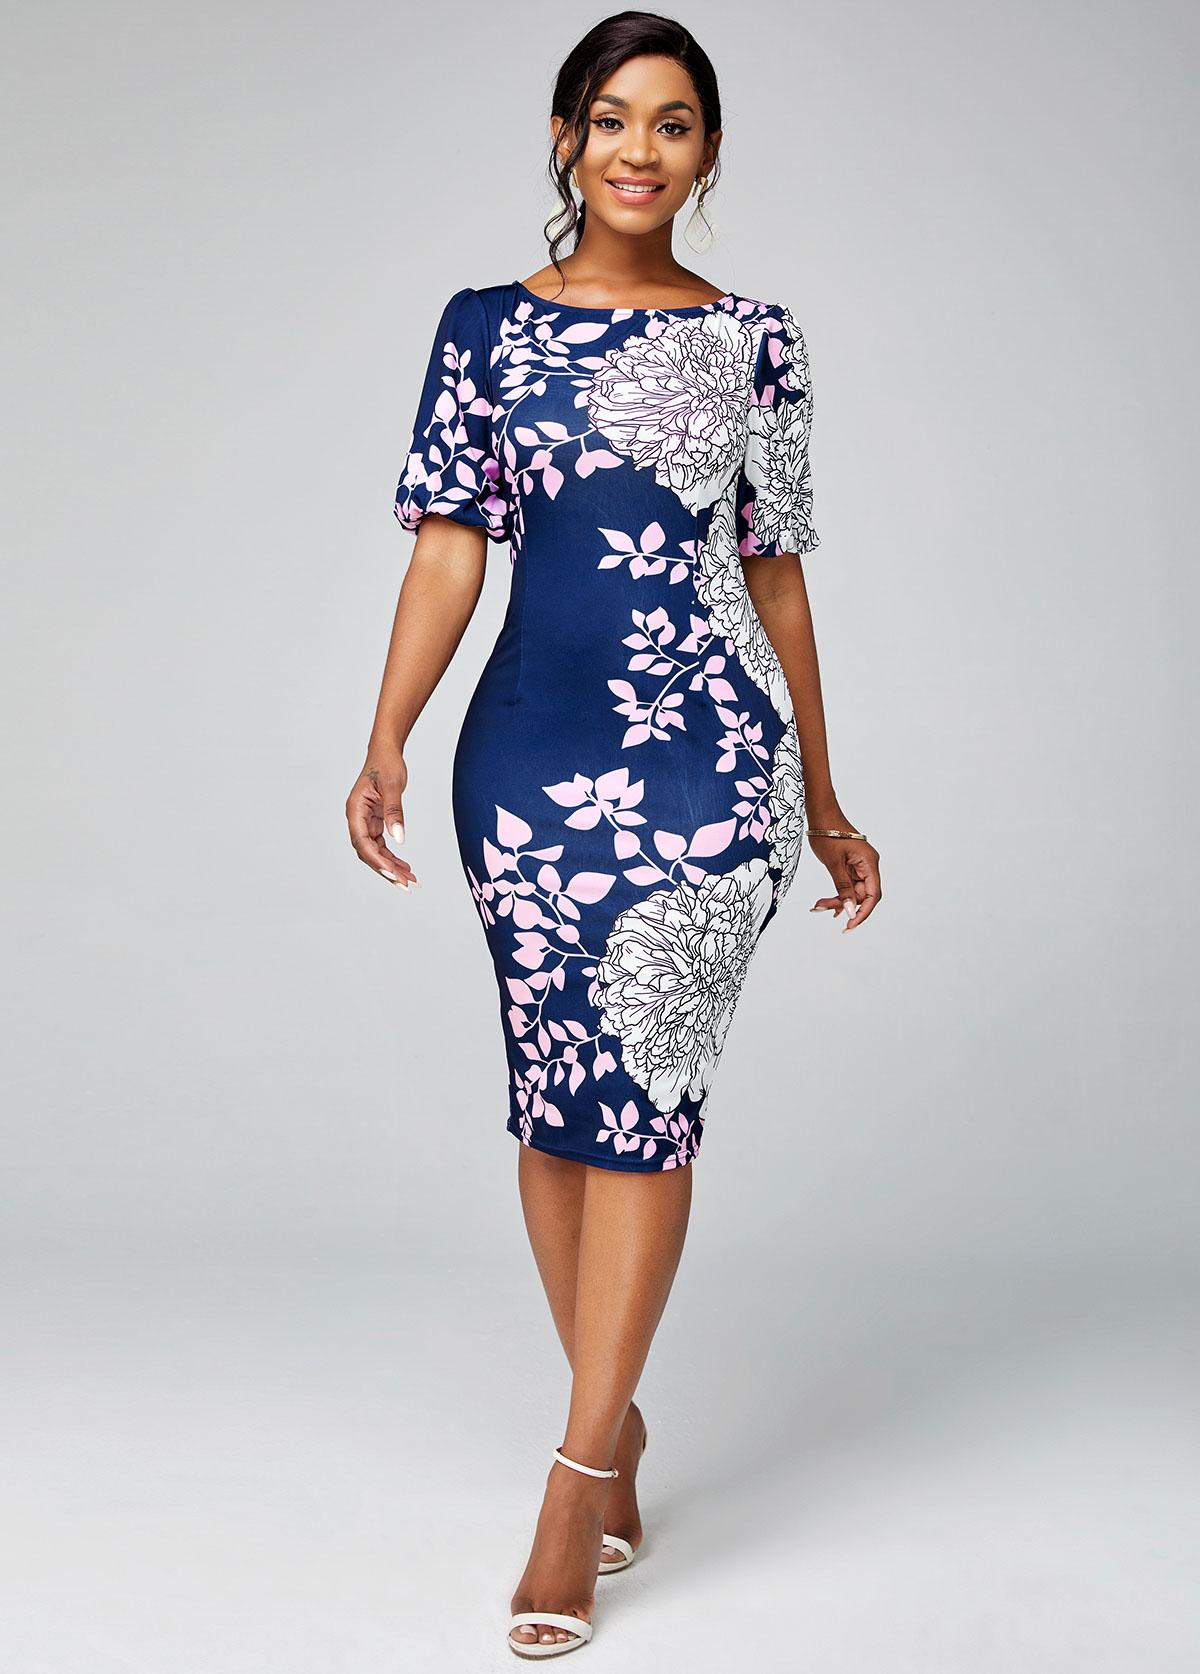 Floral Print Round Neck Short Sleeve Bodycon Dress